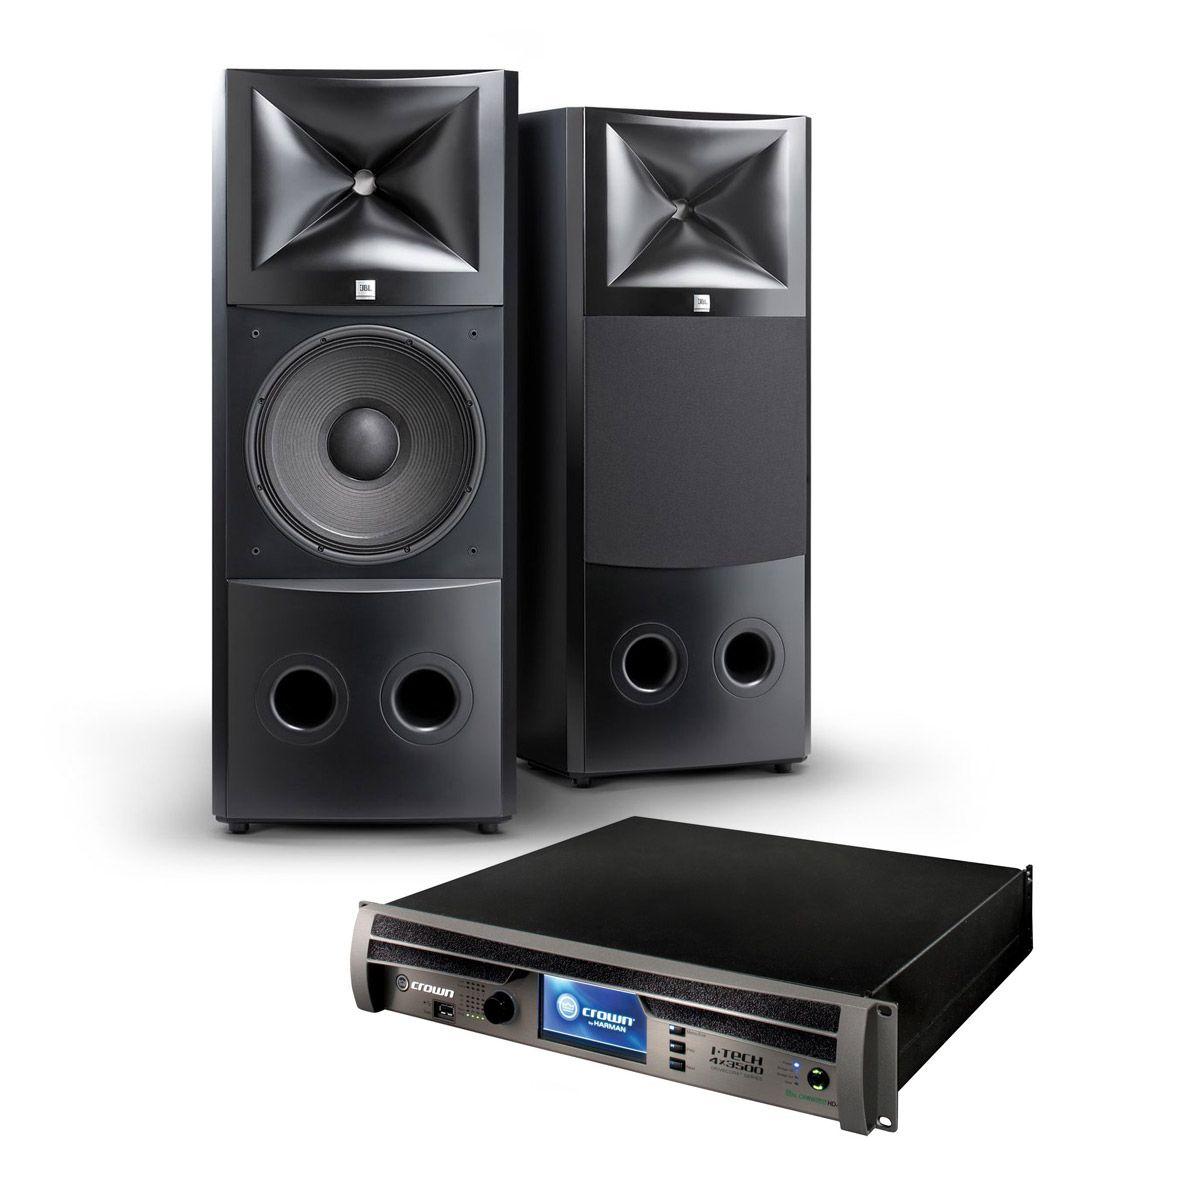 m audio av 42 pack de 2 enceintes de monitoring actives compactes syst me d 39 enceintes de. Black Bedroom Furniture Sets. Home Design Ideas